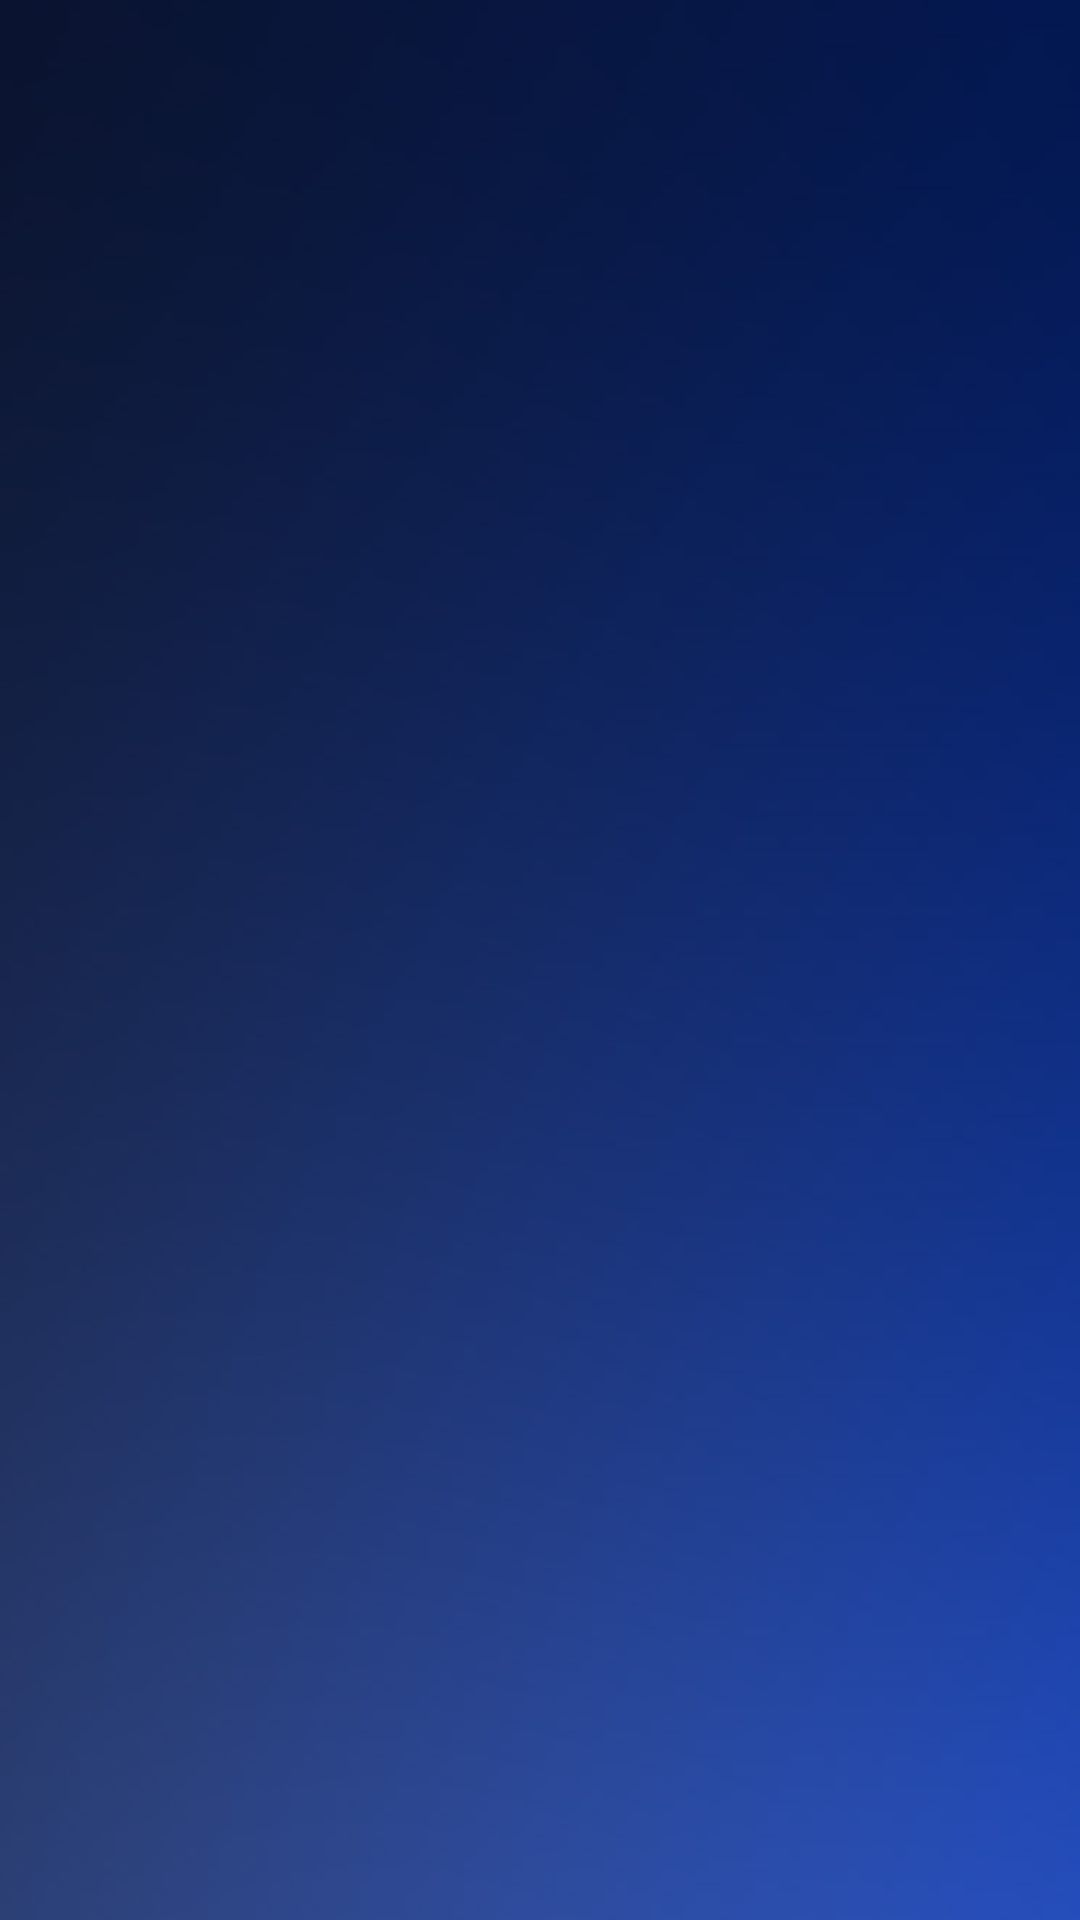 Small Crop Of Navy Blue Wallpaper